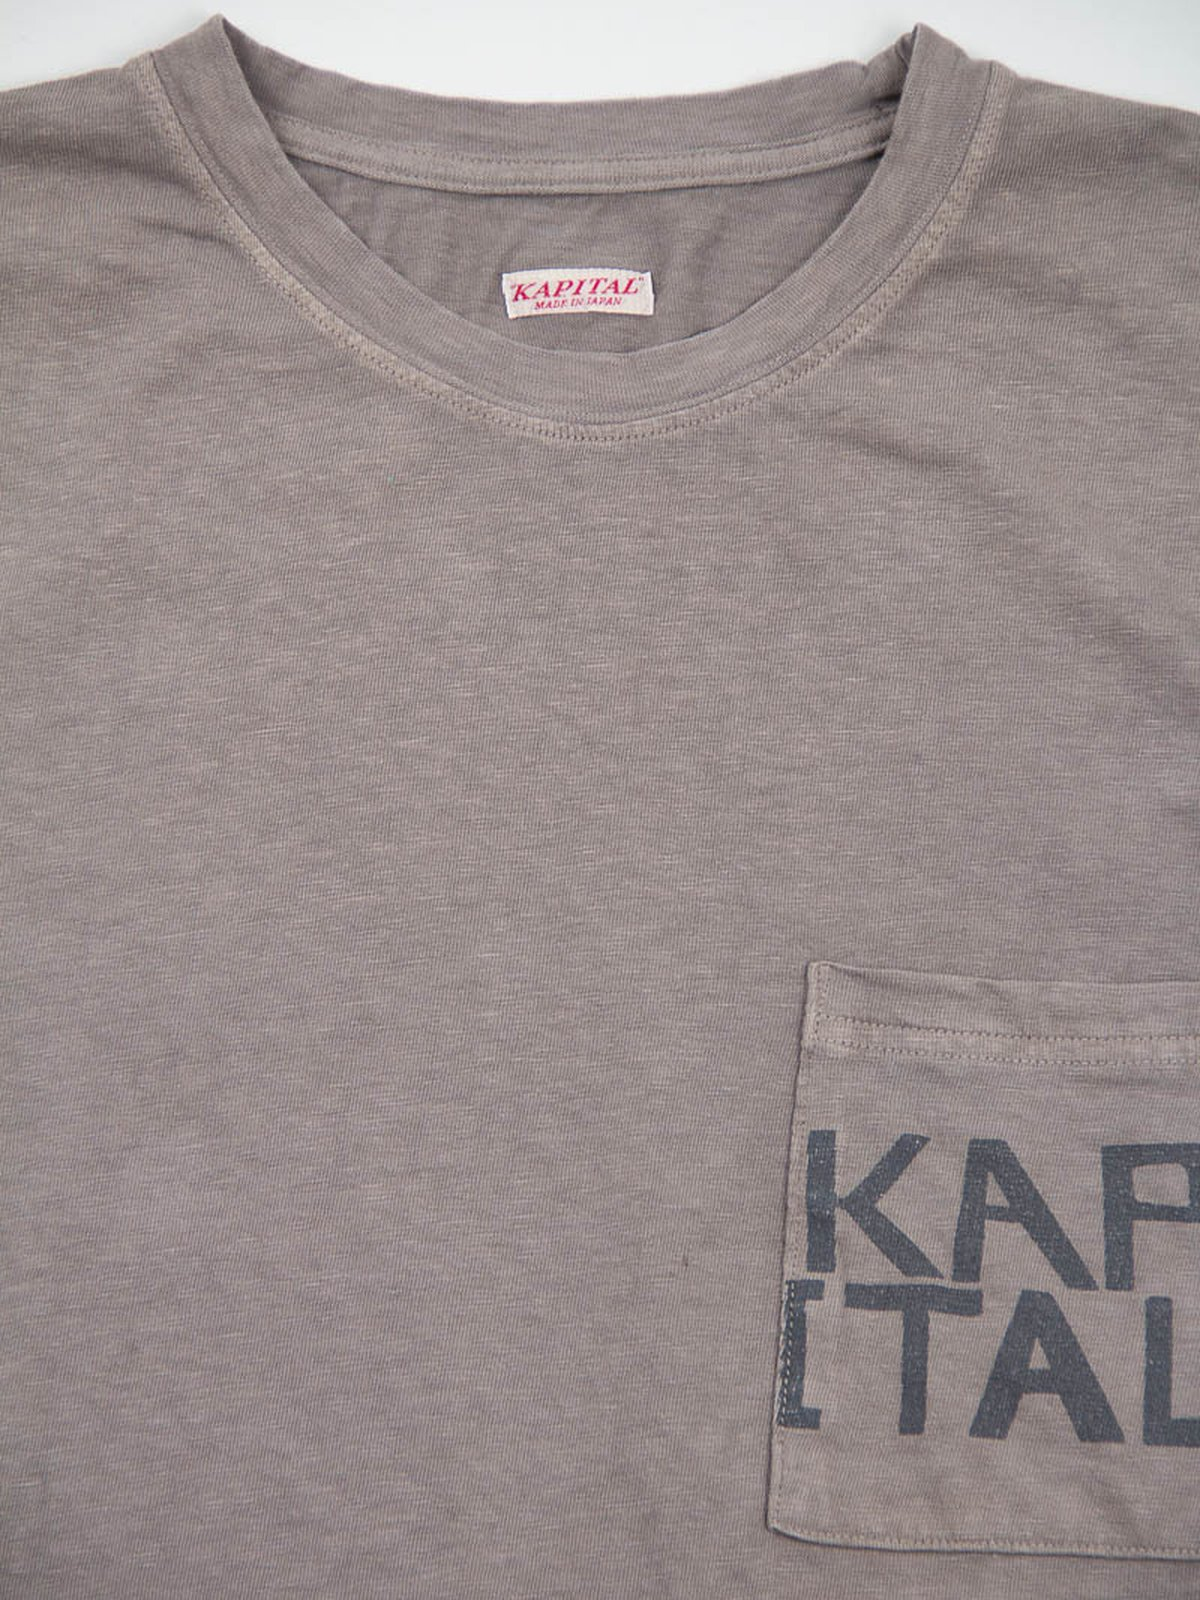 Charcoal Grey Kapital Jersey Crew Pocket T–Shirt - Image 2